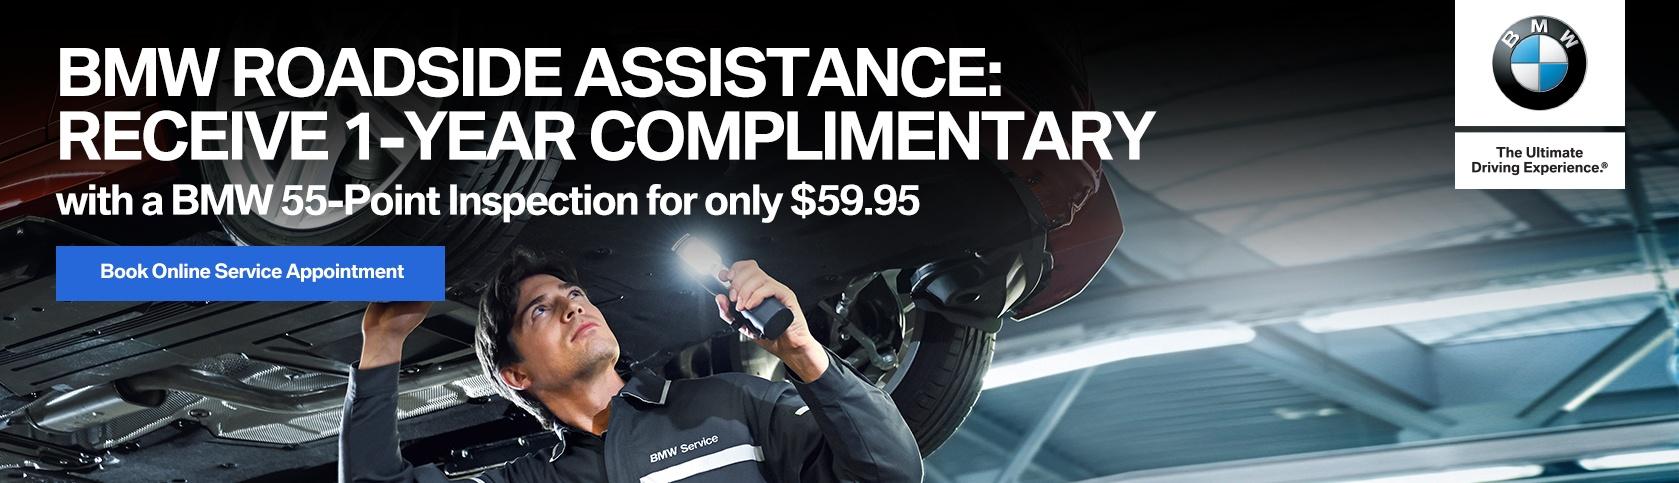 bmw roadside assistance 55 point inspection